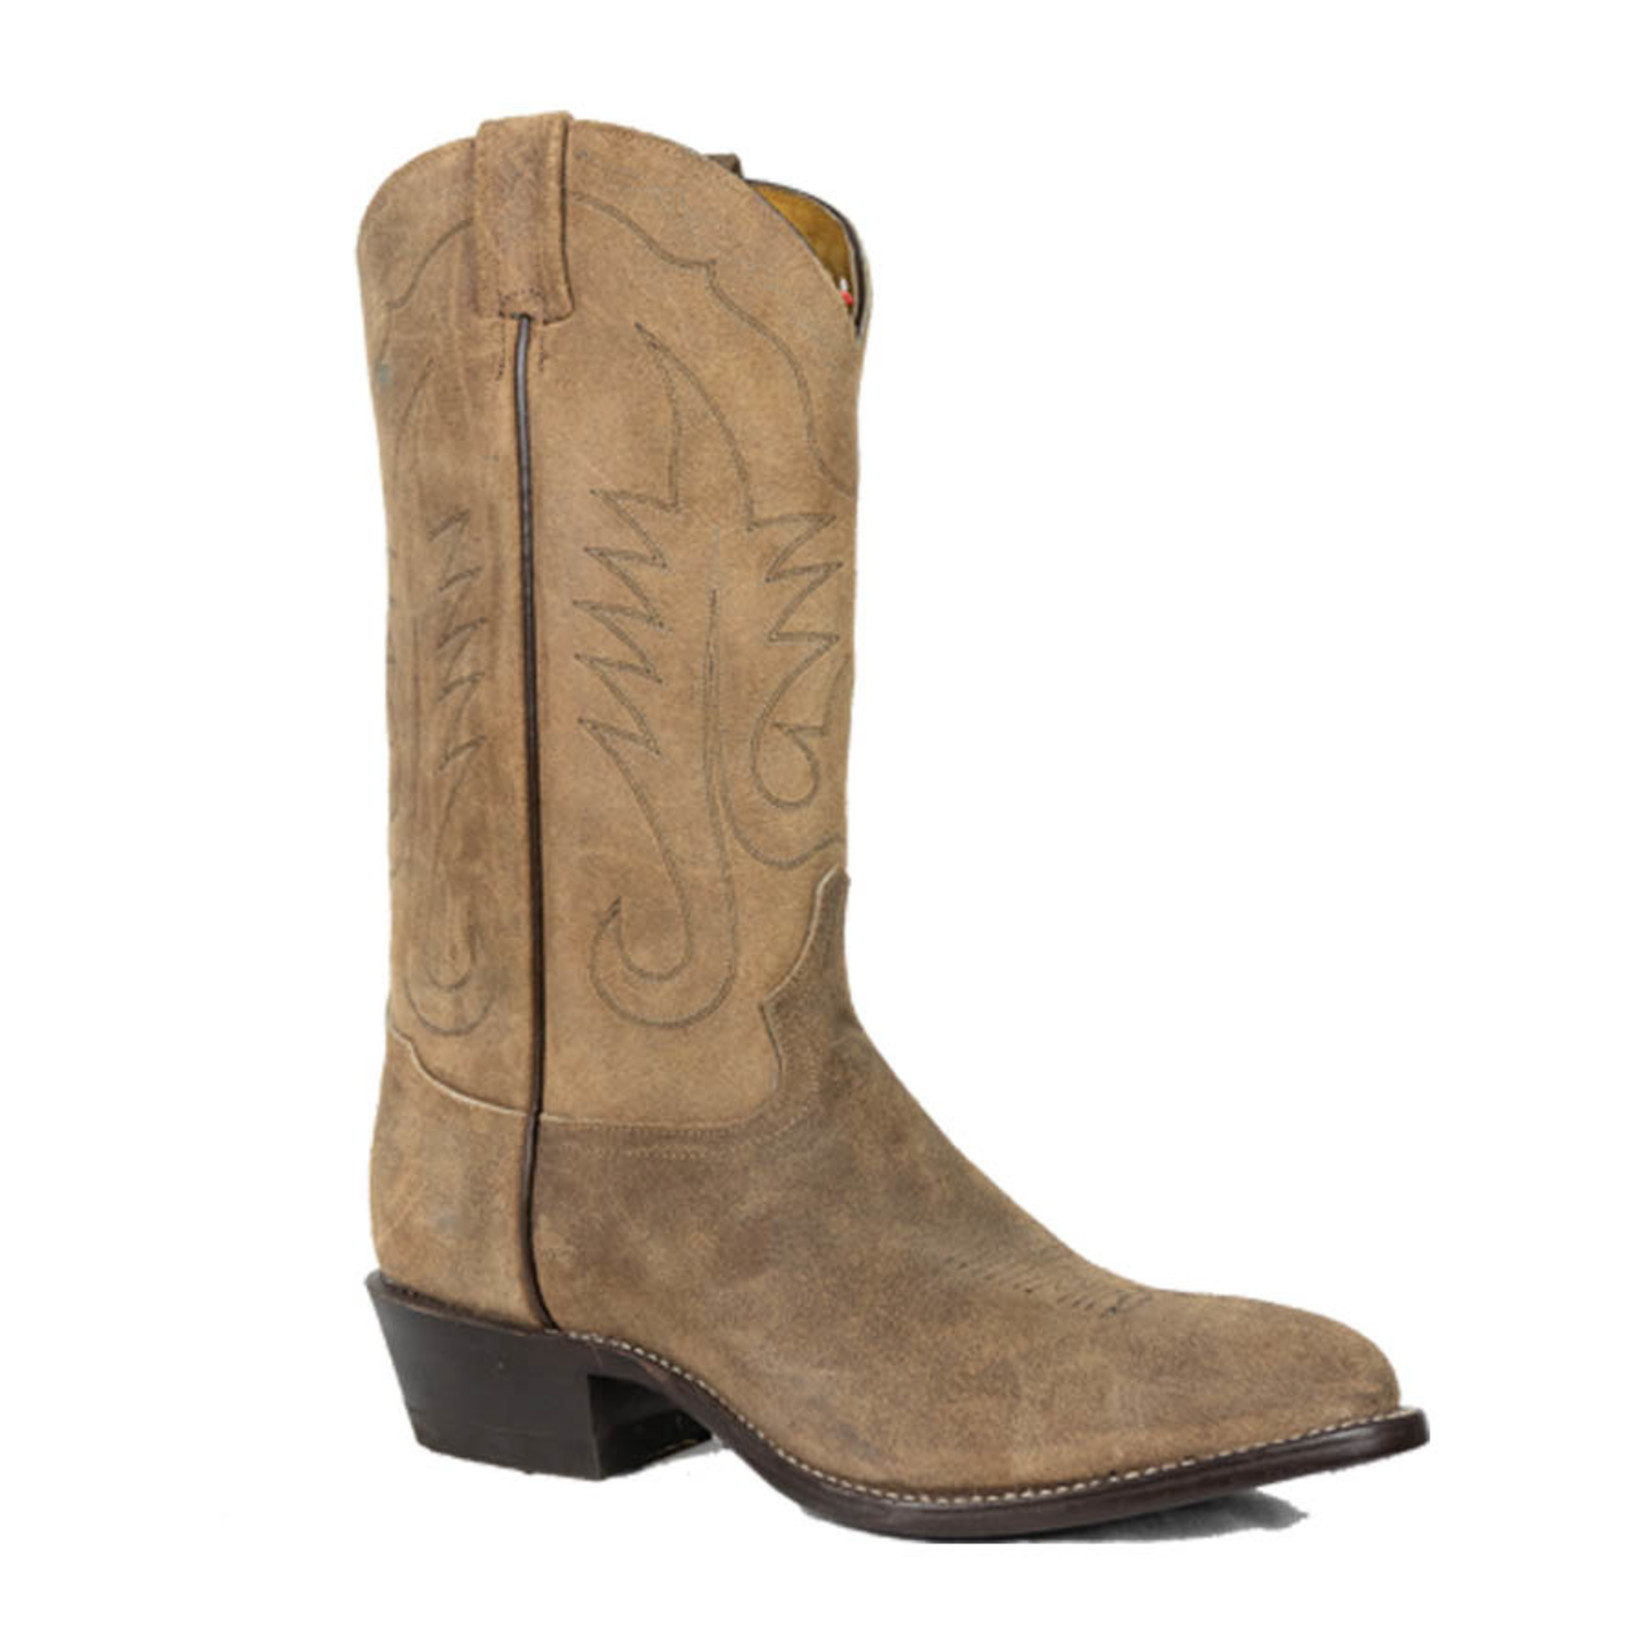 Tony Lama Tony Lama Men's Cowboy Boot 6453 2E - SIZE 10